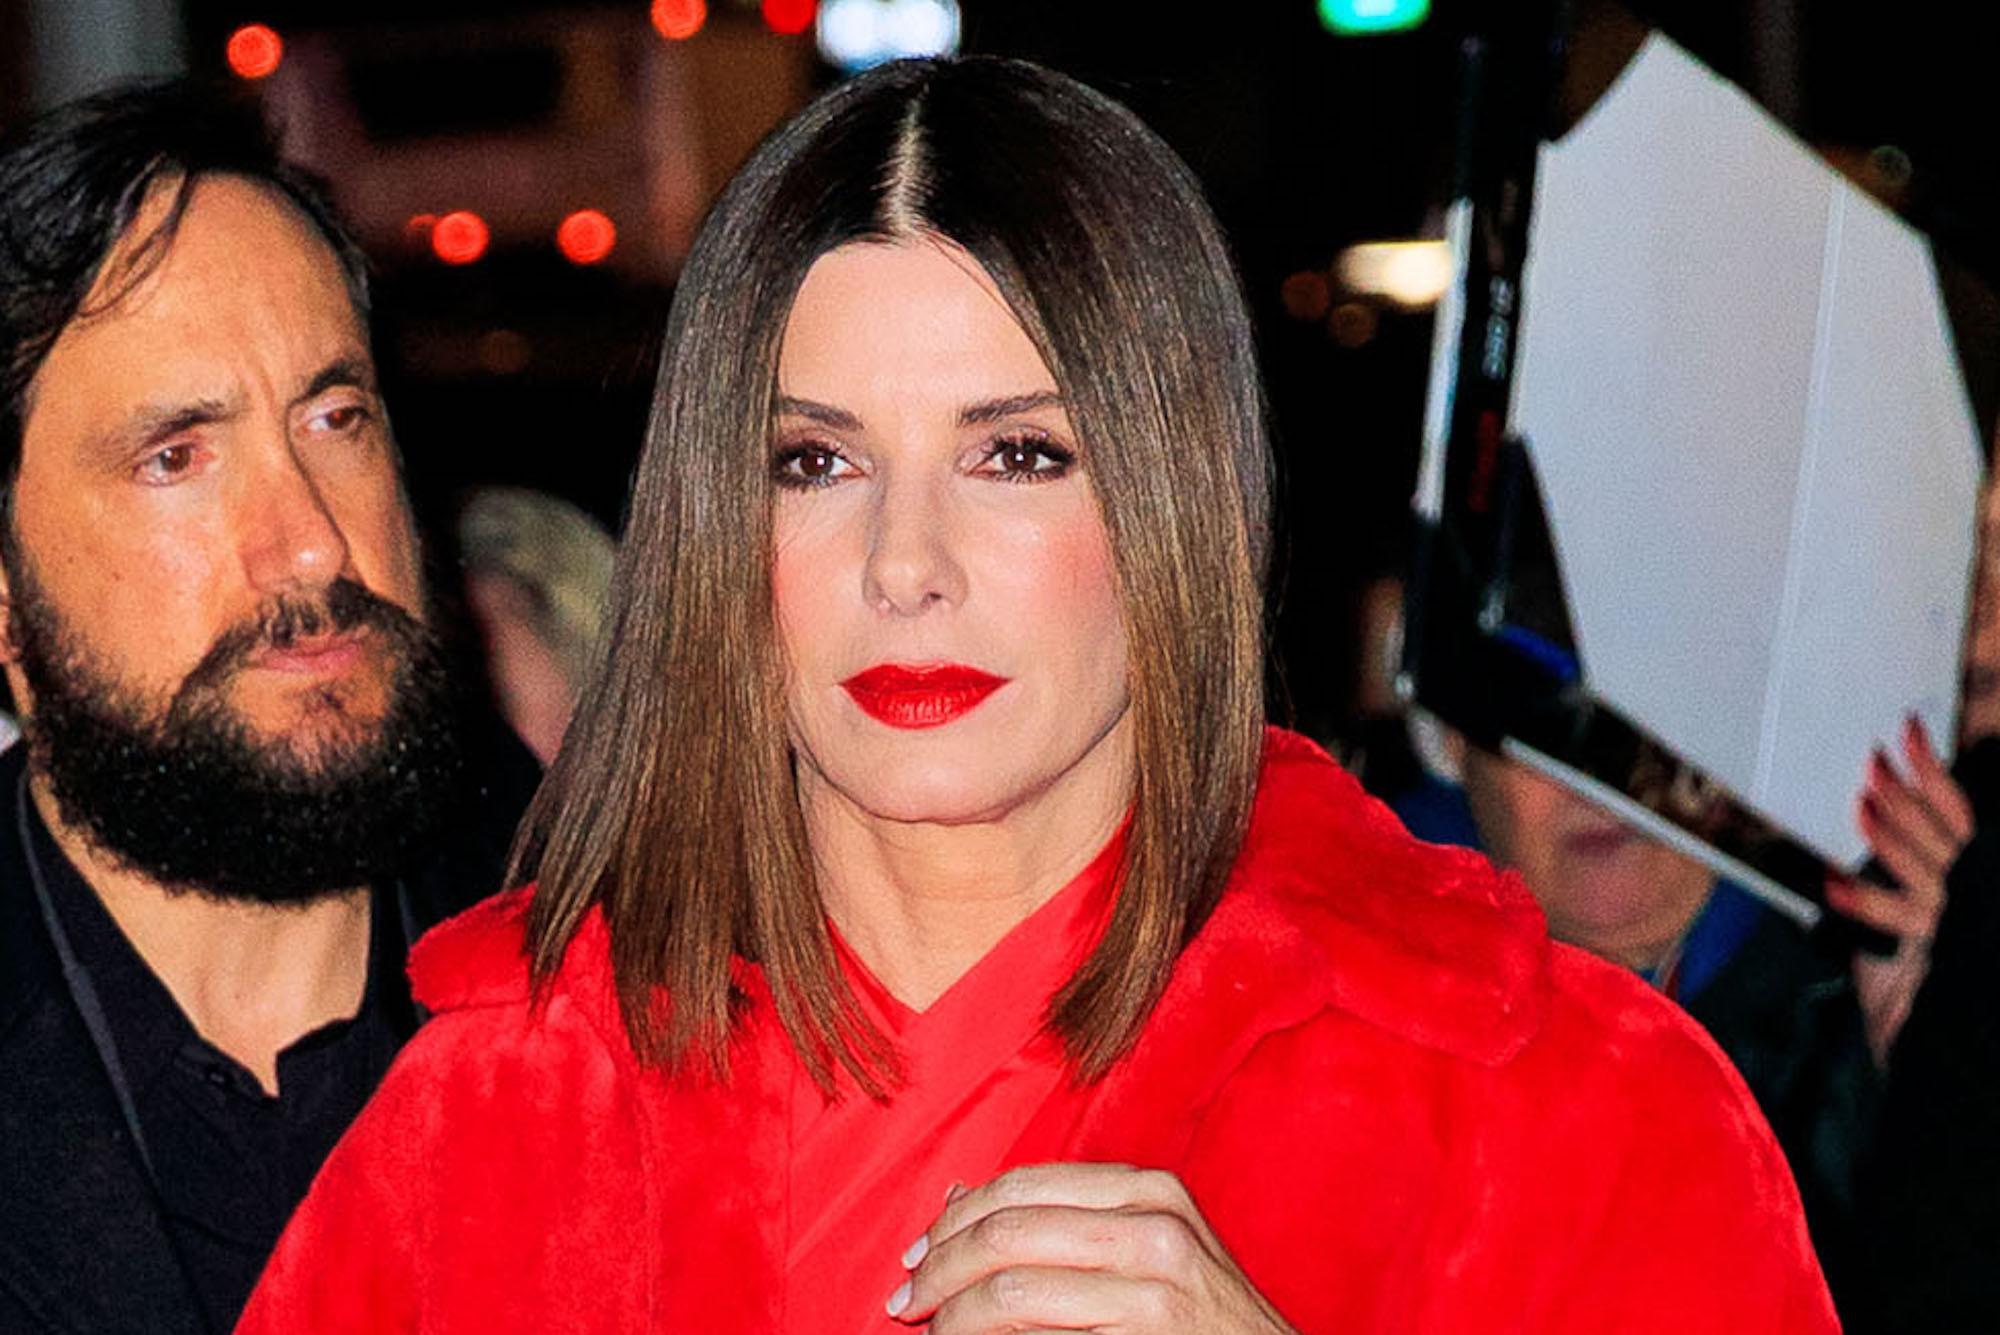 Sandra Bullock stuns in red-hot look worth $6K